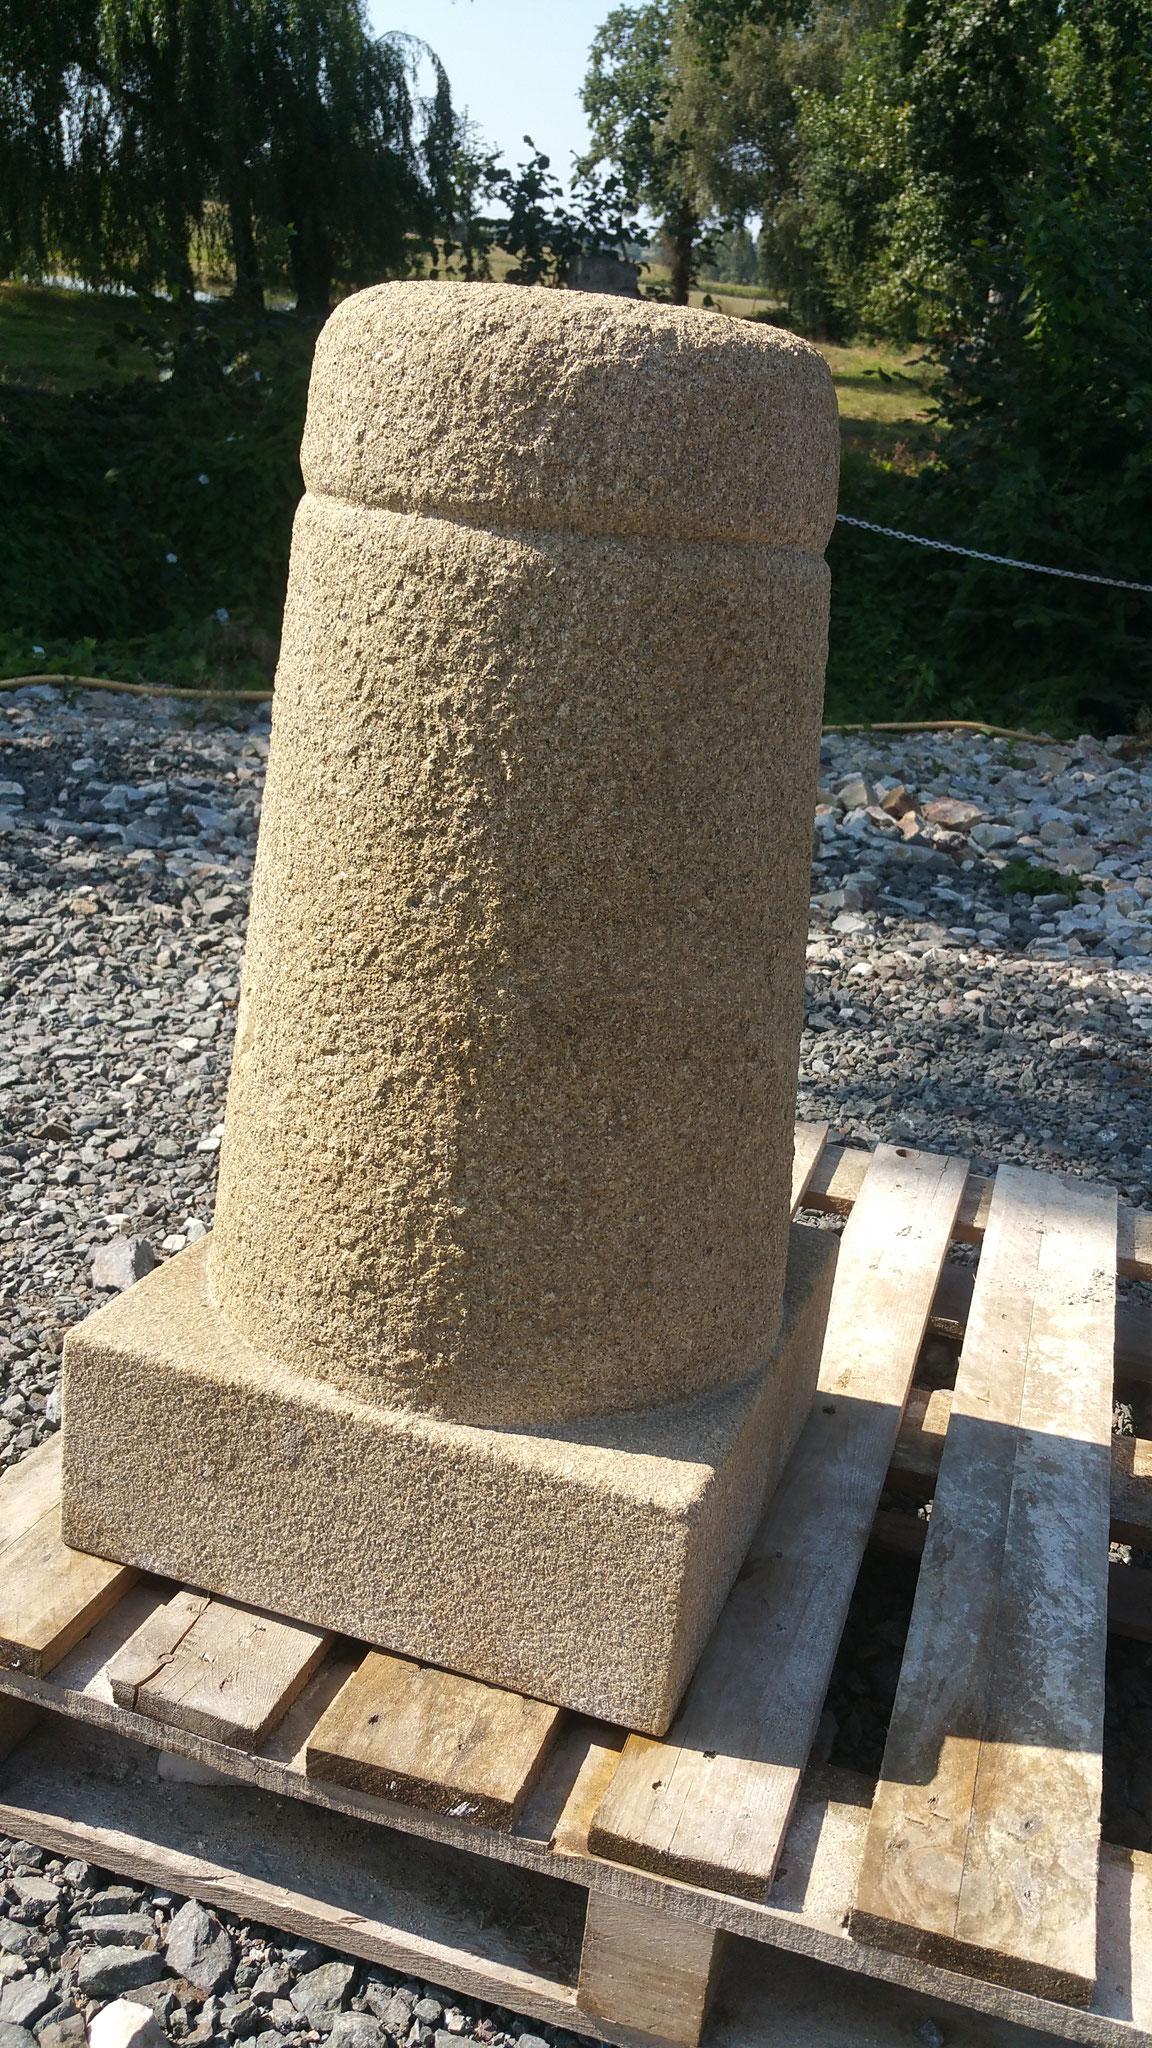 chasse-roue granit